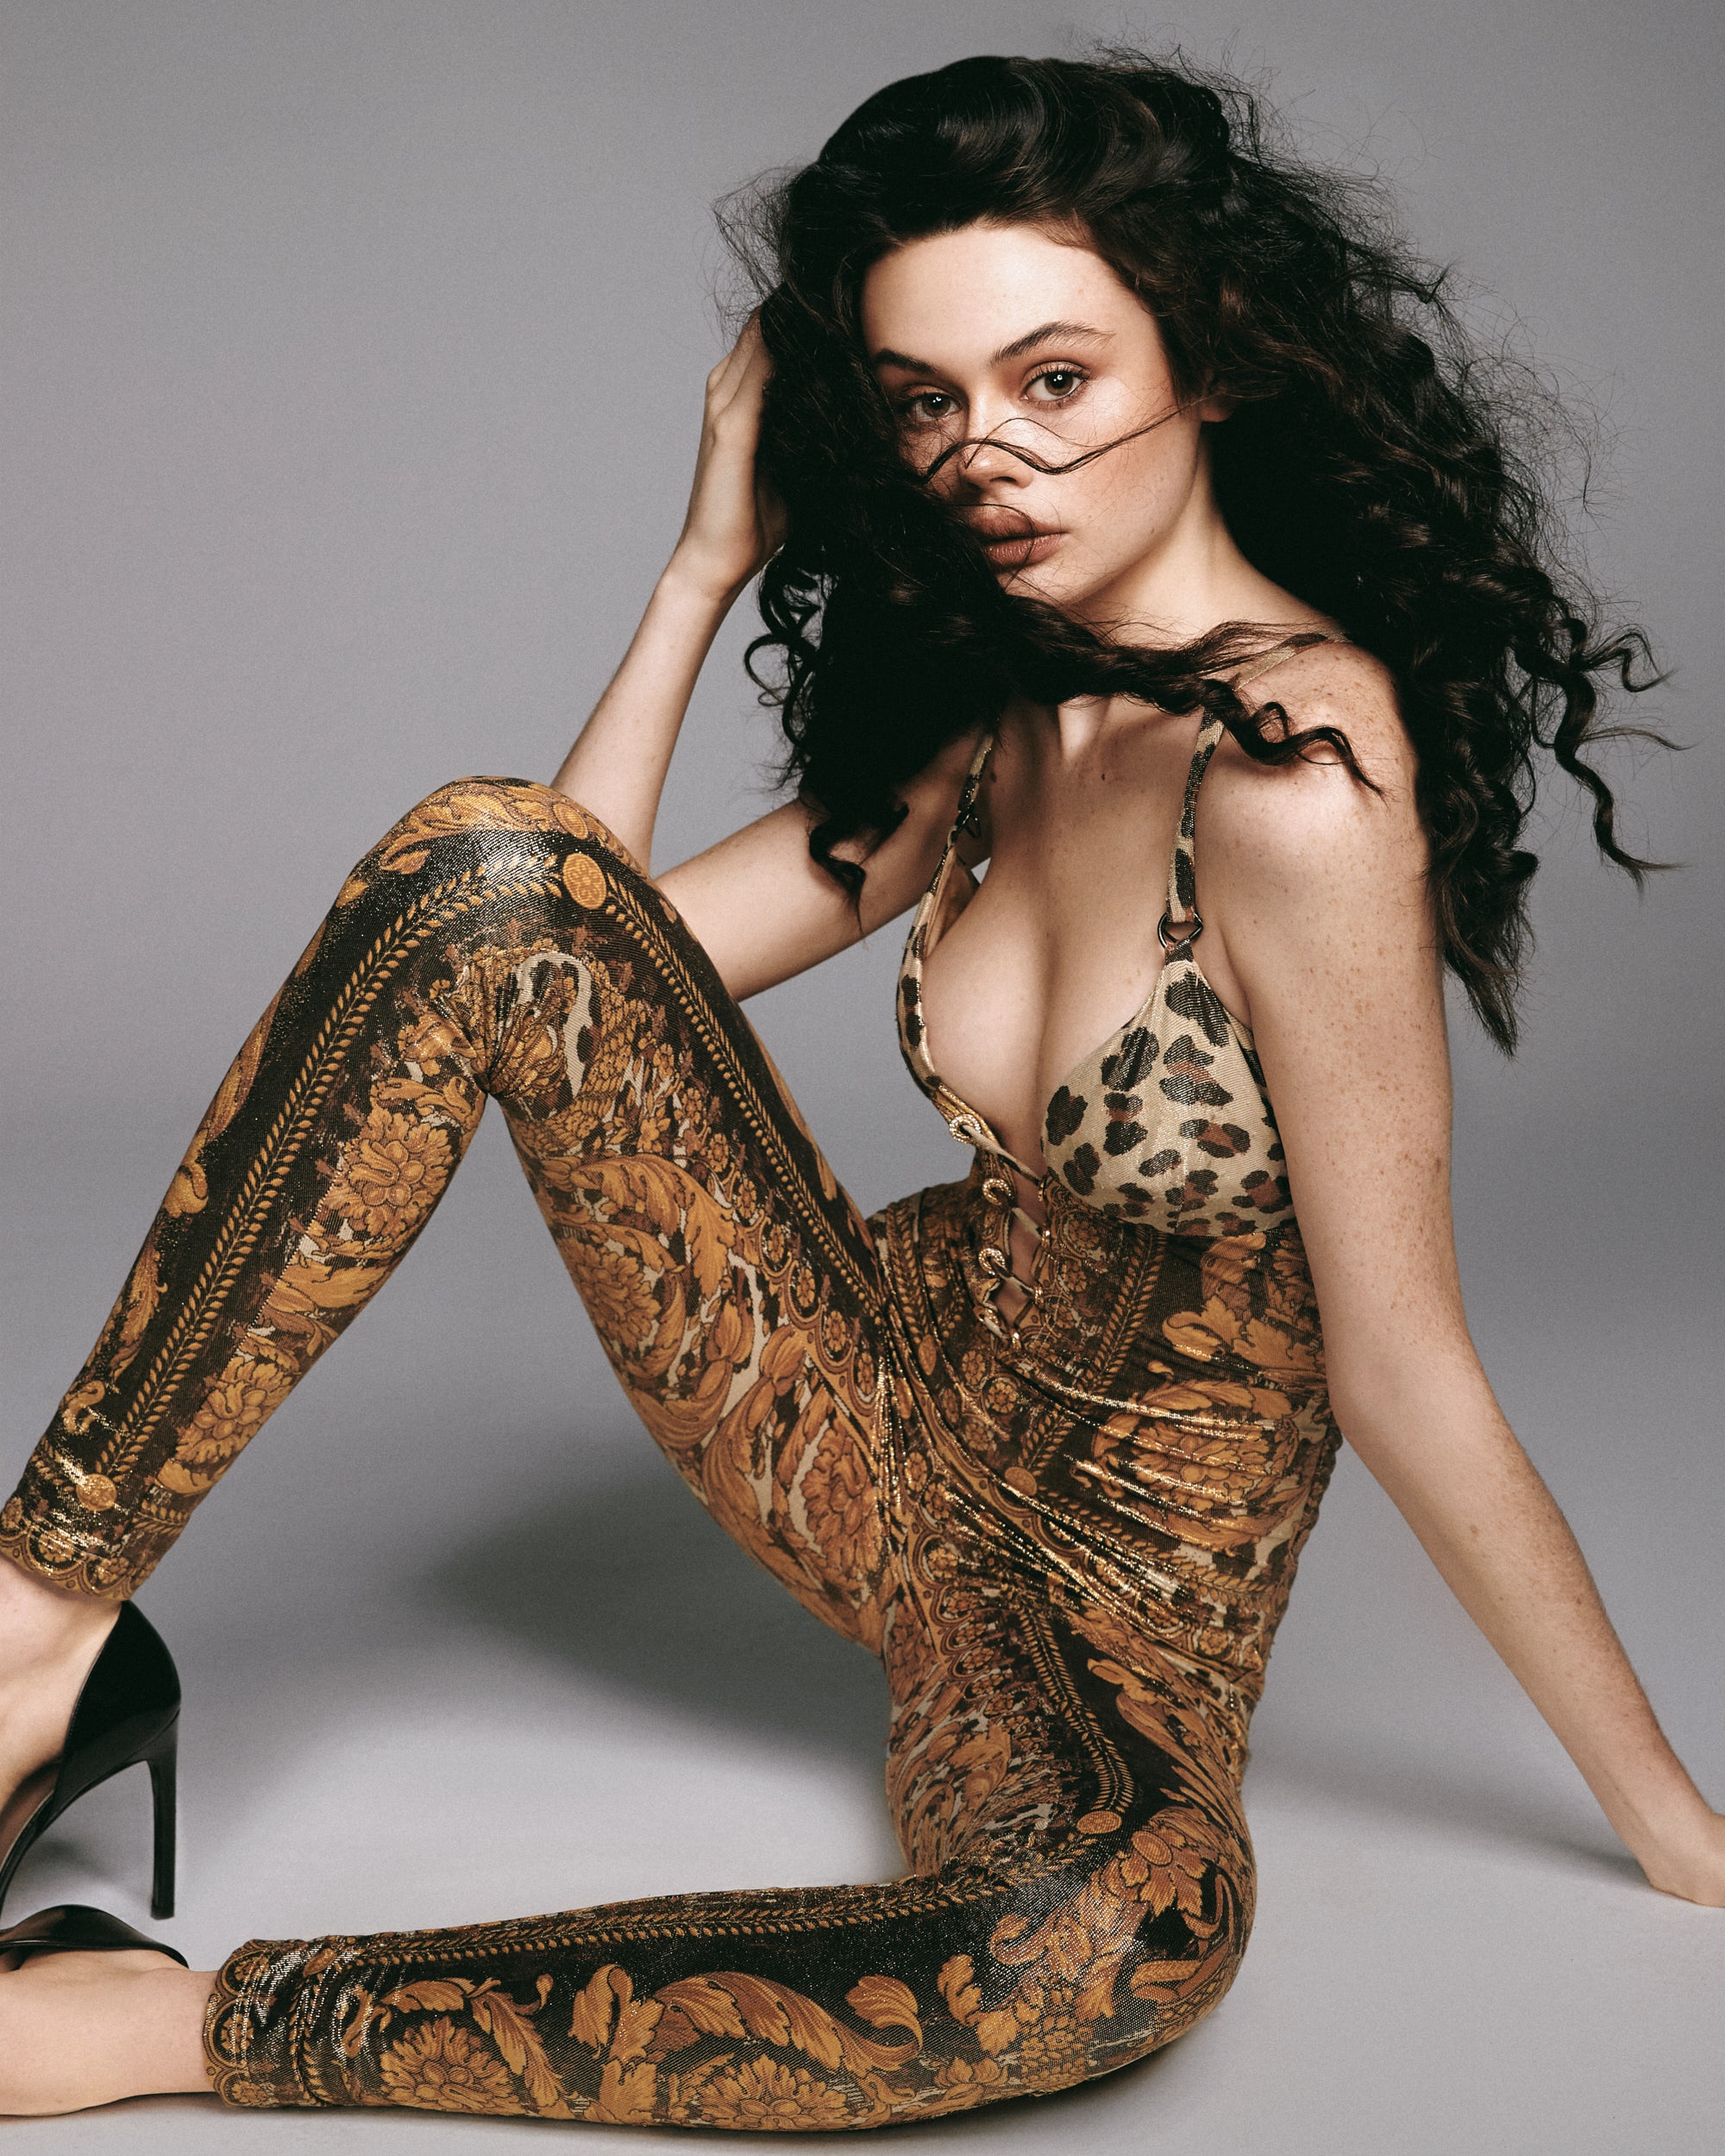 Ava Peterson Vintage Versace Fashion Editorial.jpg